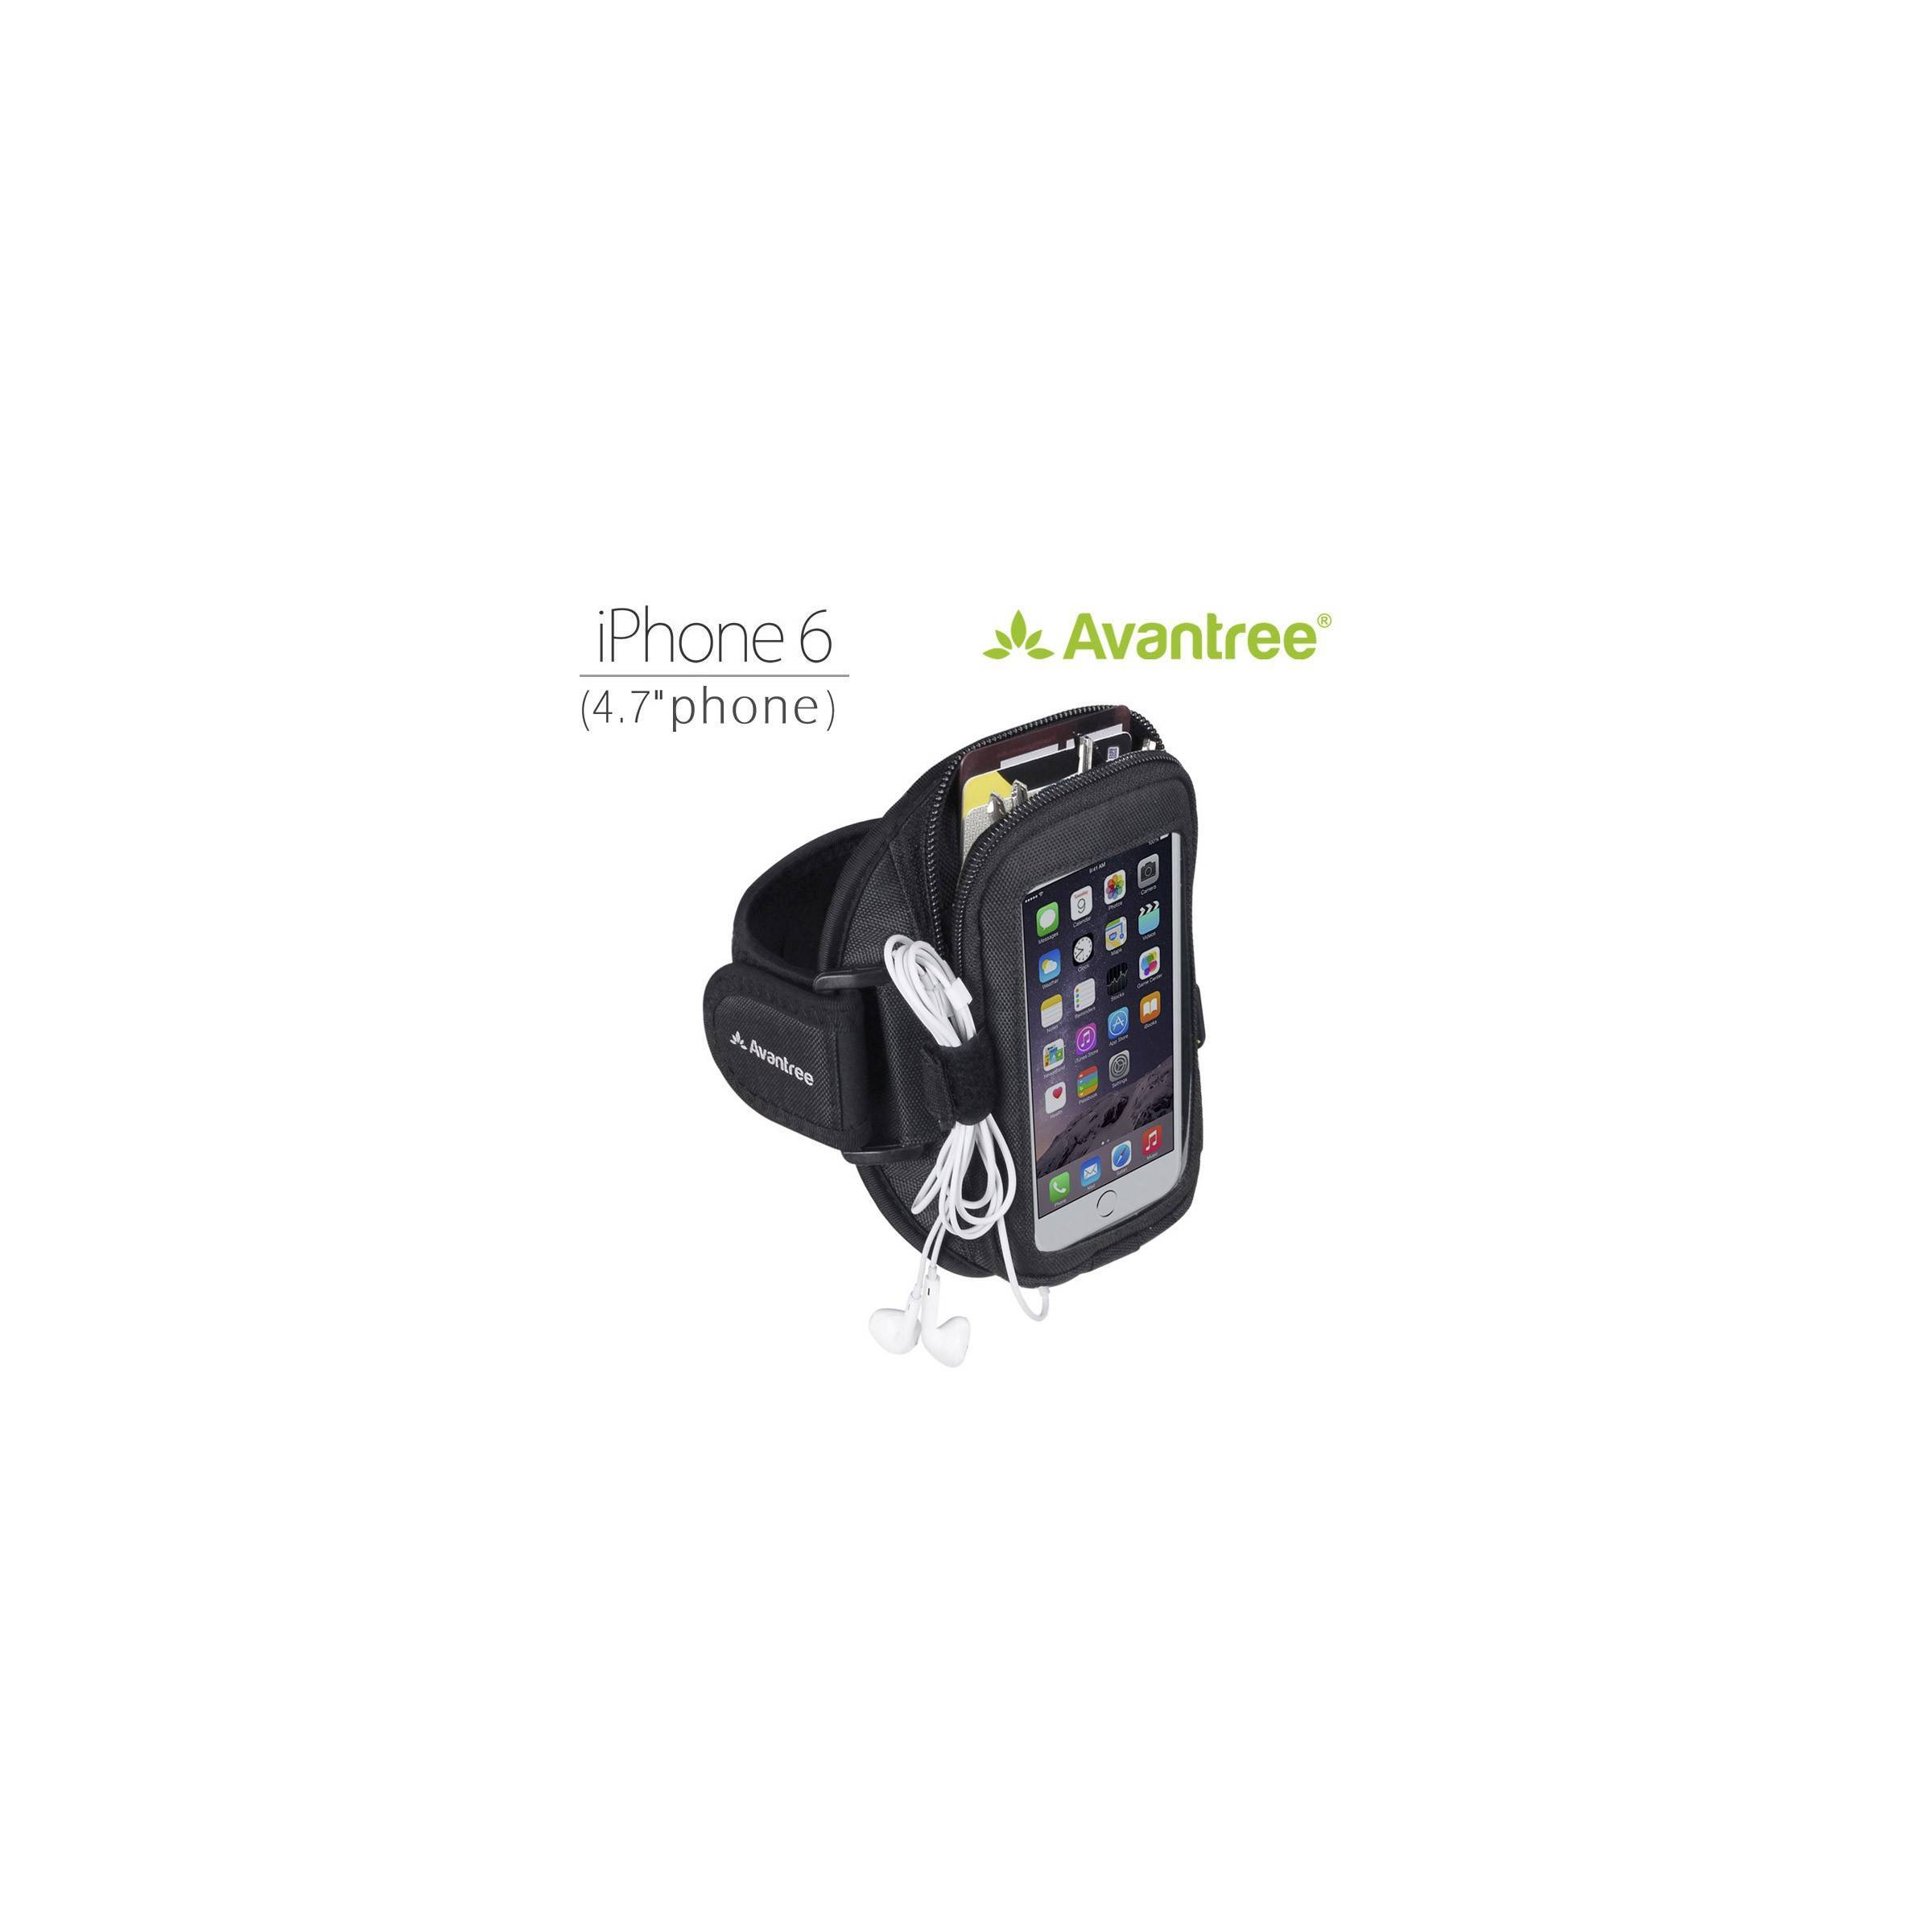 avantree Avantree ninja armband løbearmbånd til iphone 6/6s/7/8/x/xs fra mackabler.dk